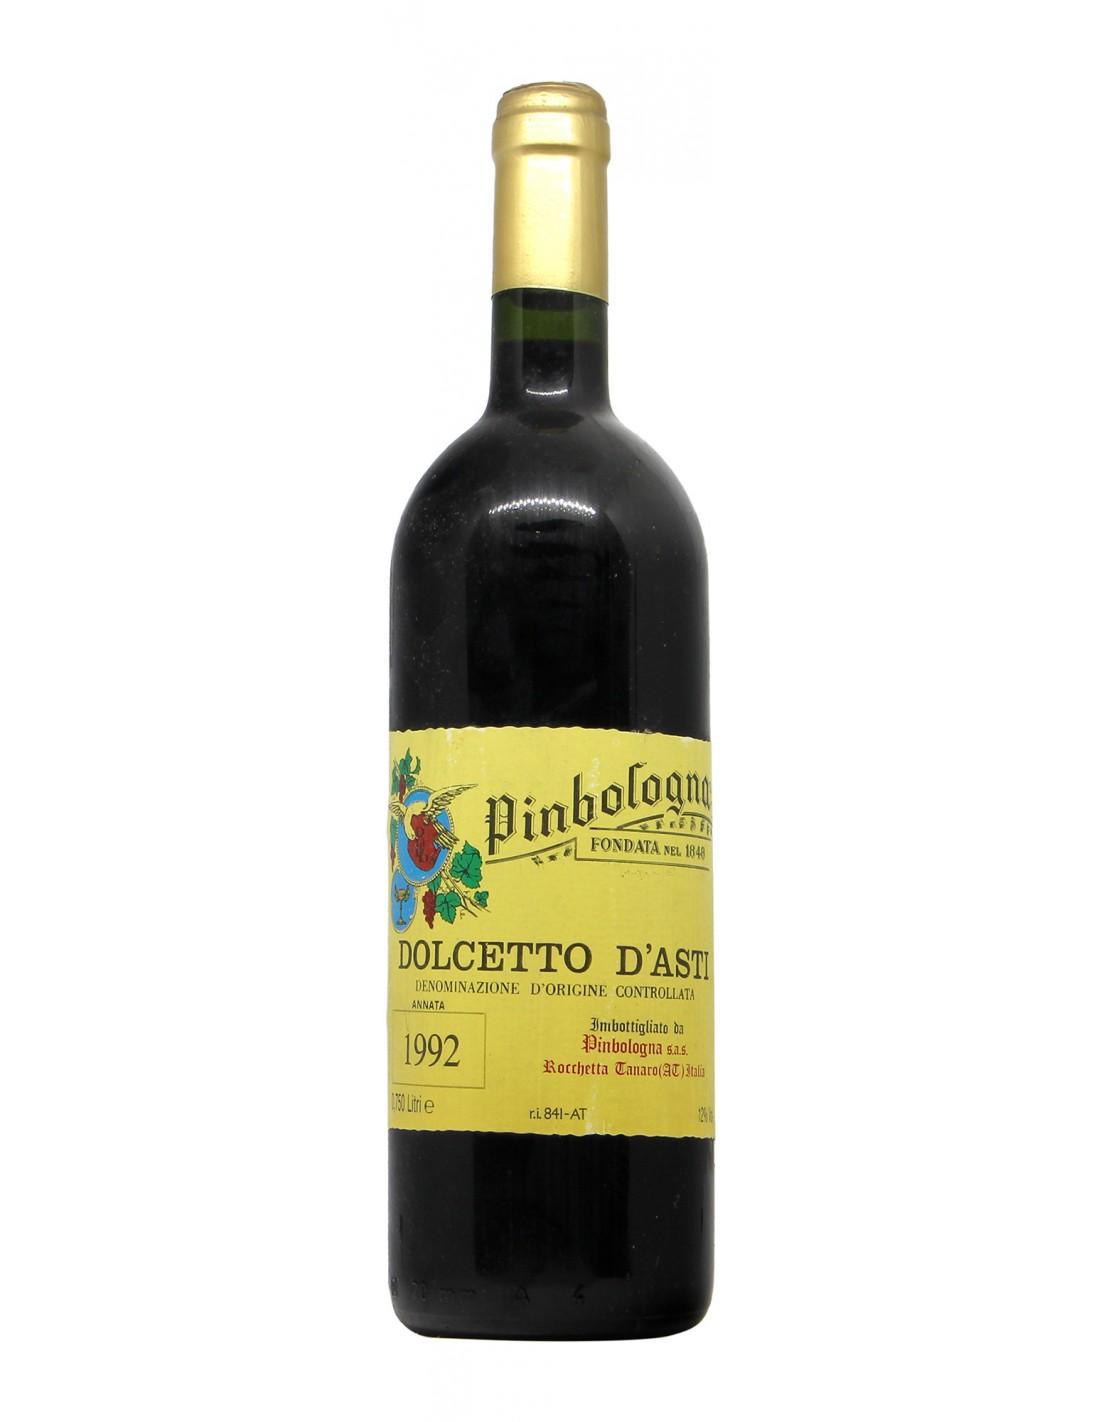 DOLCETTO ASTI 1992 PINBOLOGNA Grandi Bottiglie